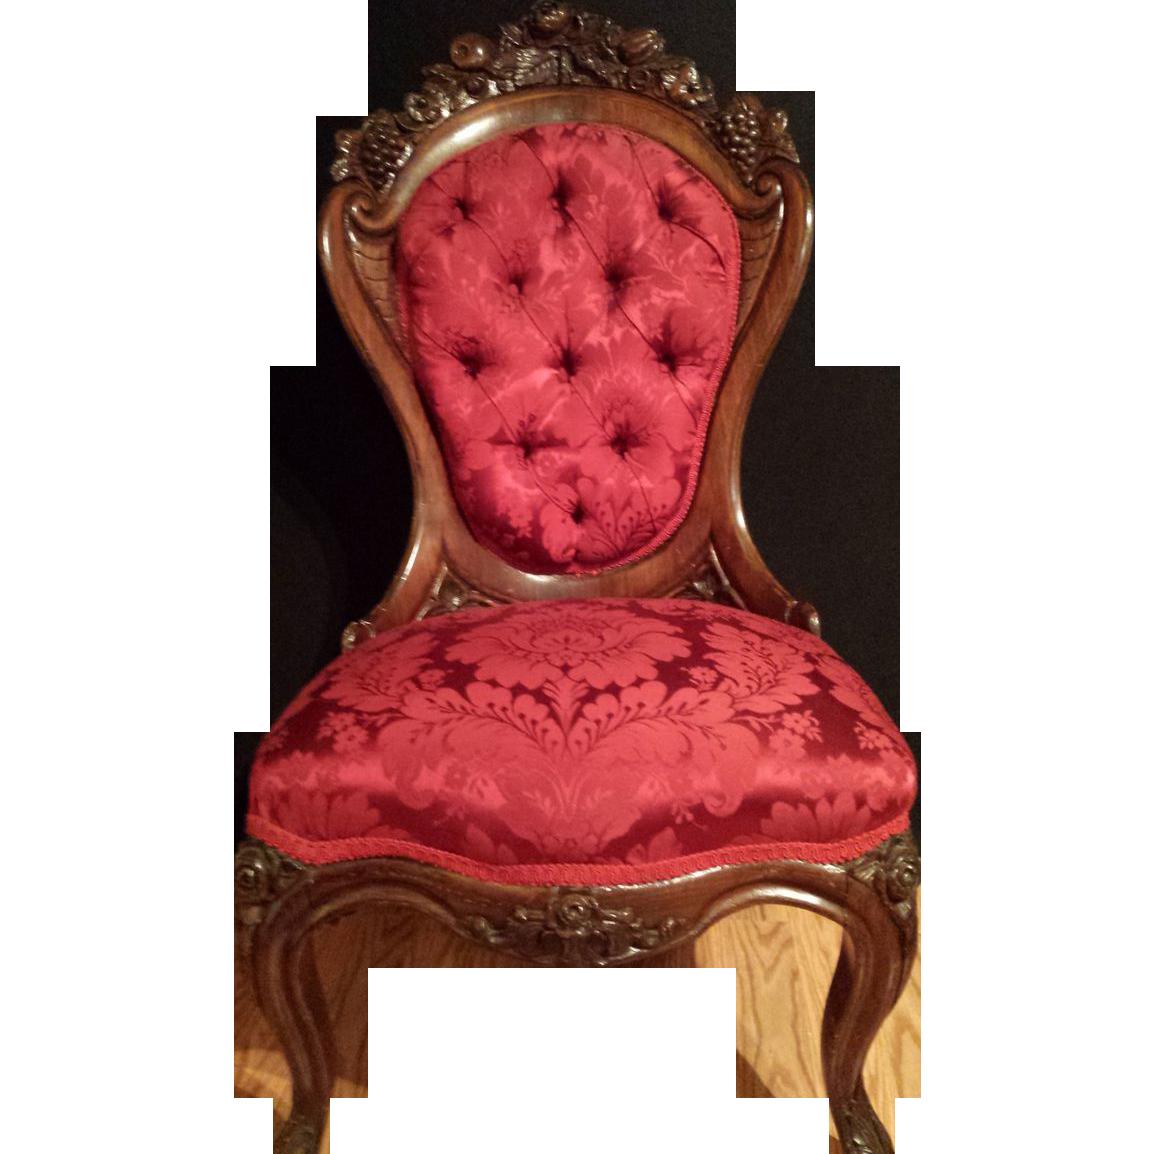 John Henry Belter Rosewood Antique Victorian Chair, Rosalie w/ Grape Pattern - John Henry Belter Rosewood Antique Victorian Chair, Rosalie W